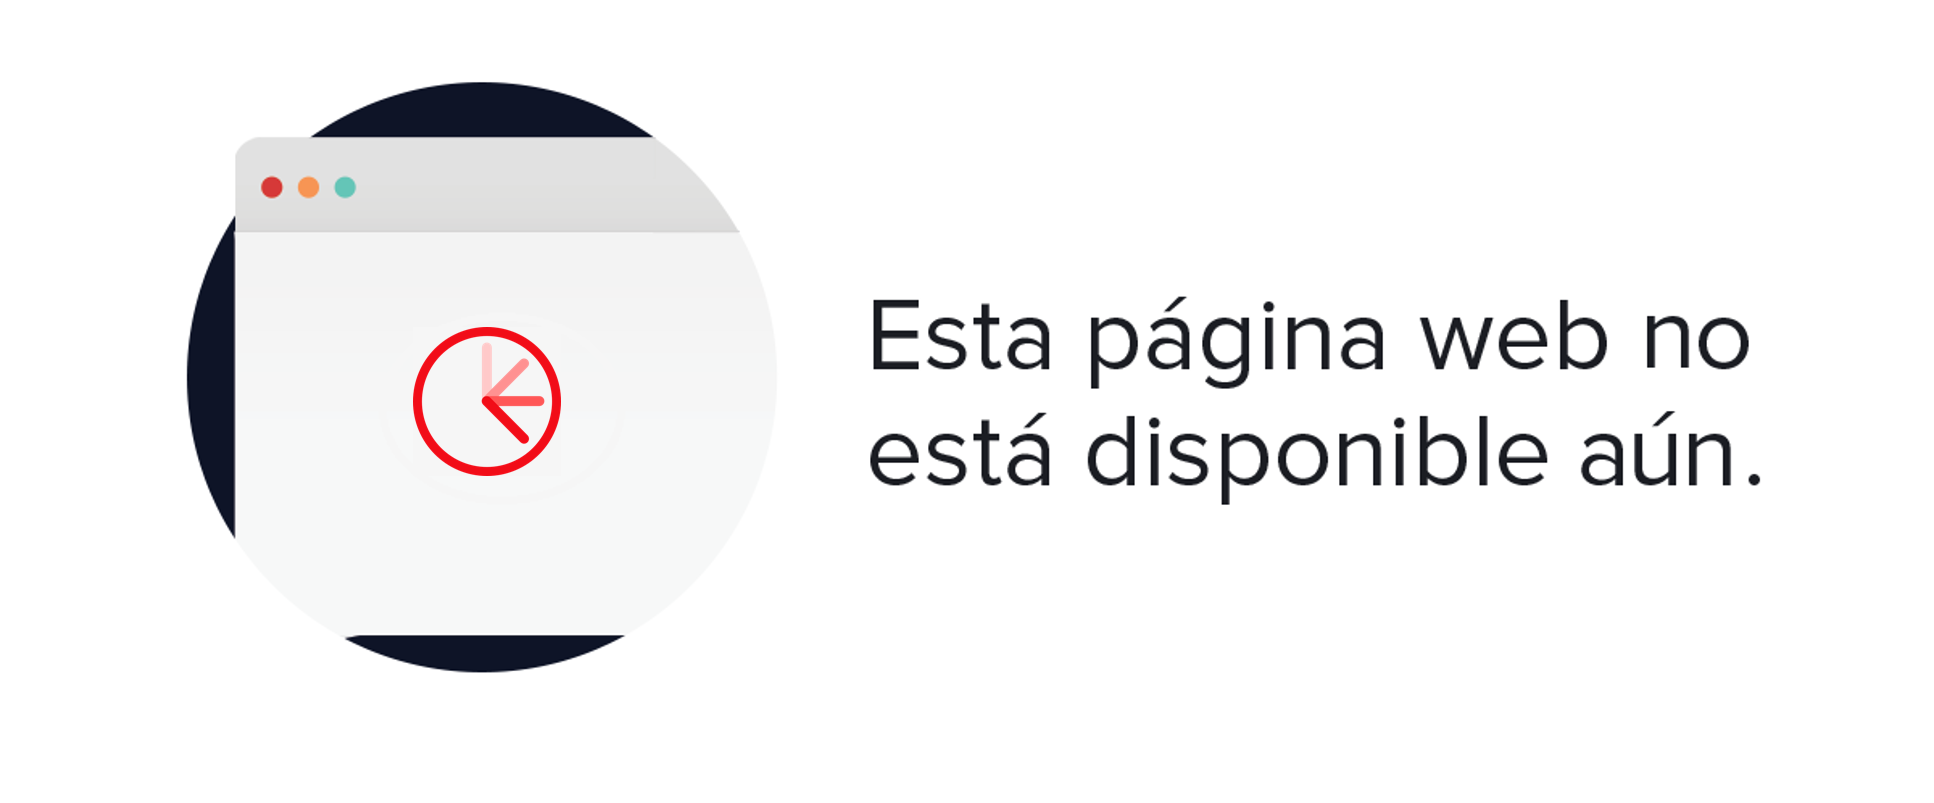 Elogy - Pantalón fluido de mujer Elogy con goma en la cintura Negro 001084936100225003 - GNVVAQT